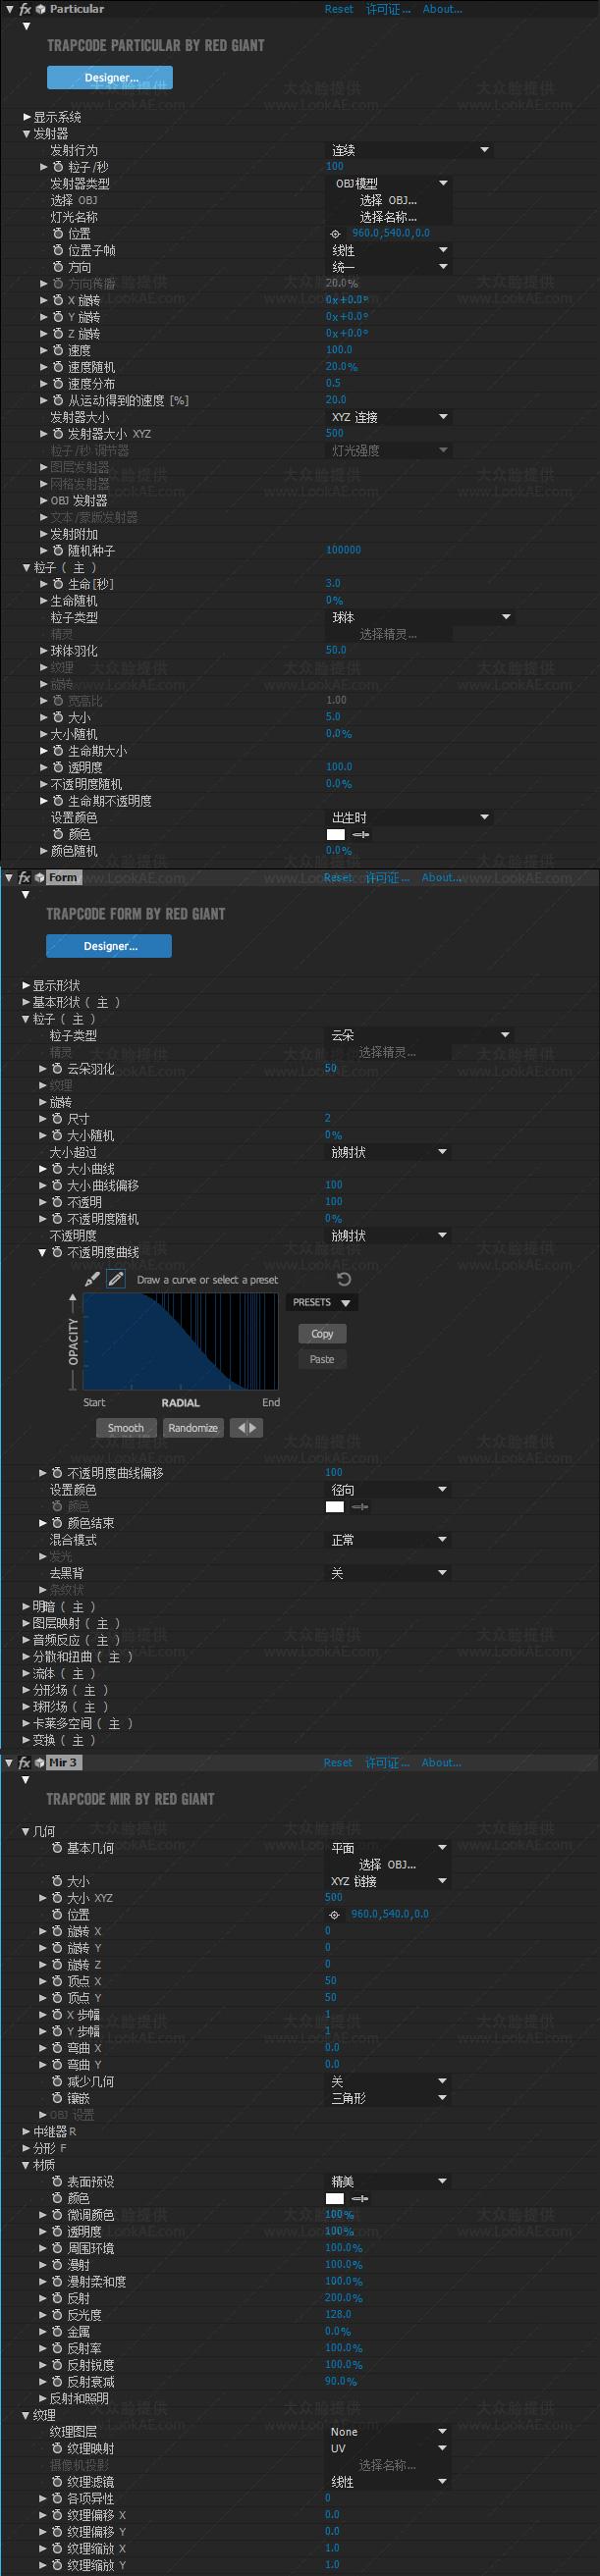 中文汉化-红巨人粒子套装合集AE插件 Red Giant Trapcode Suite 15.1.8 Win版插图1